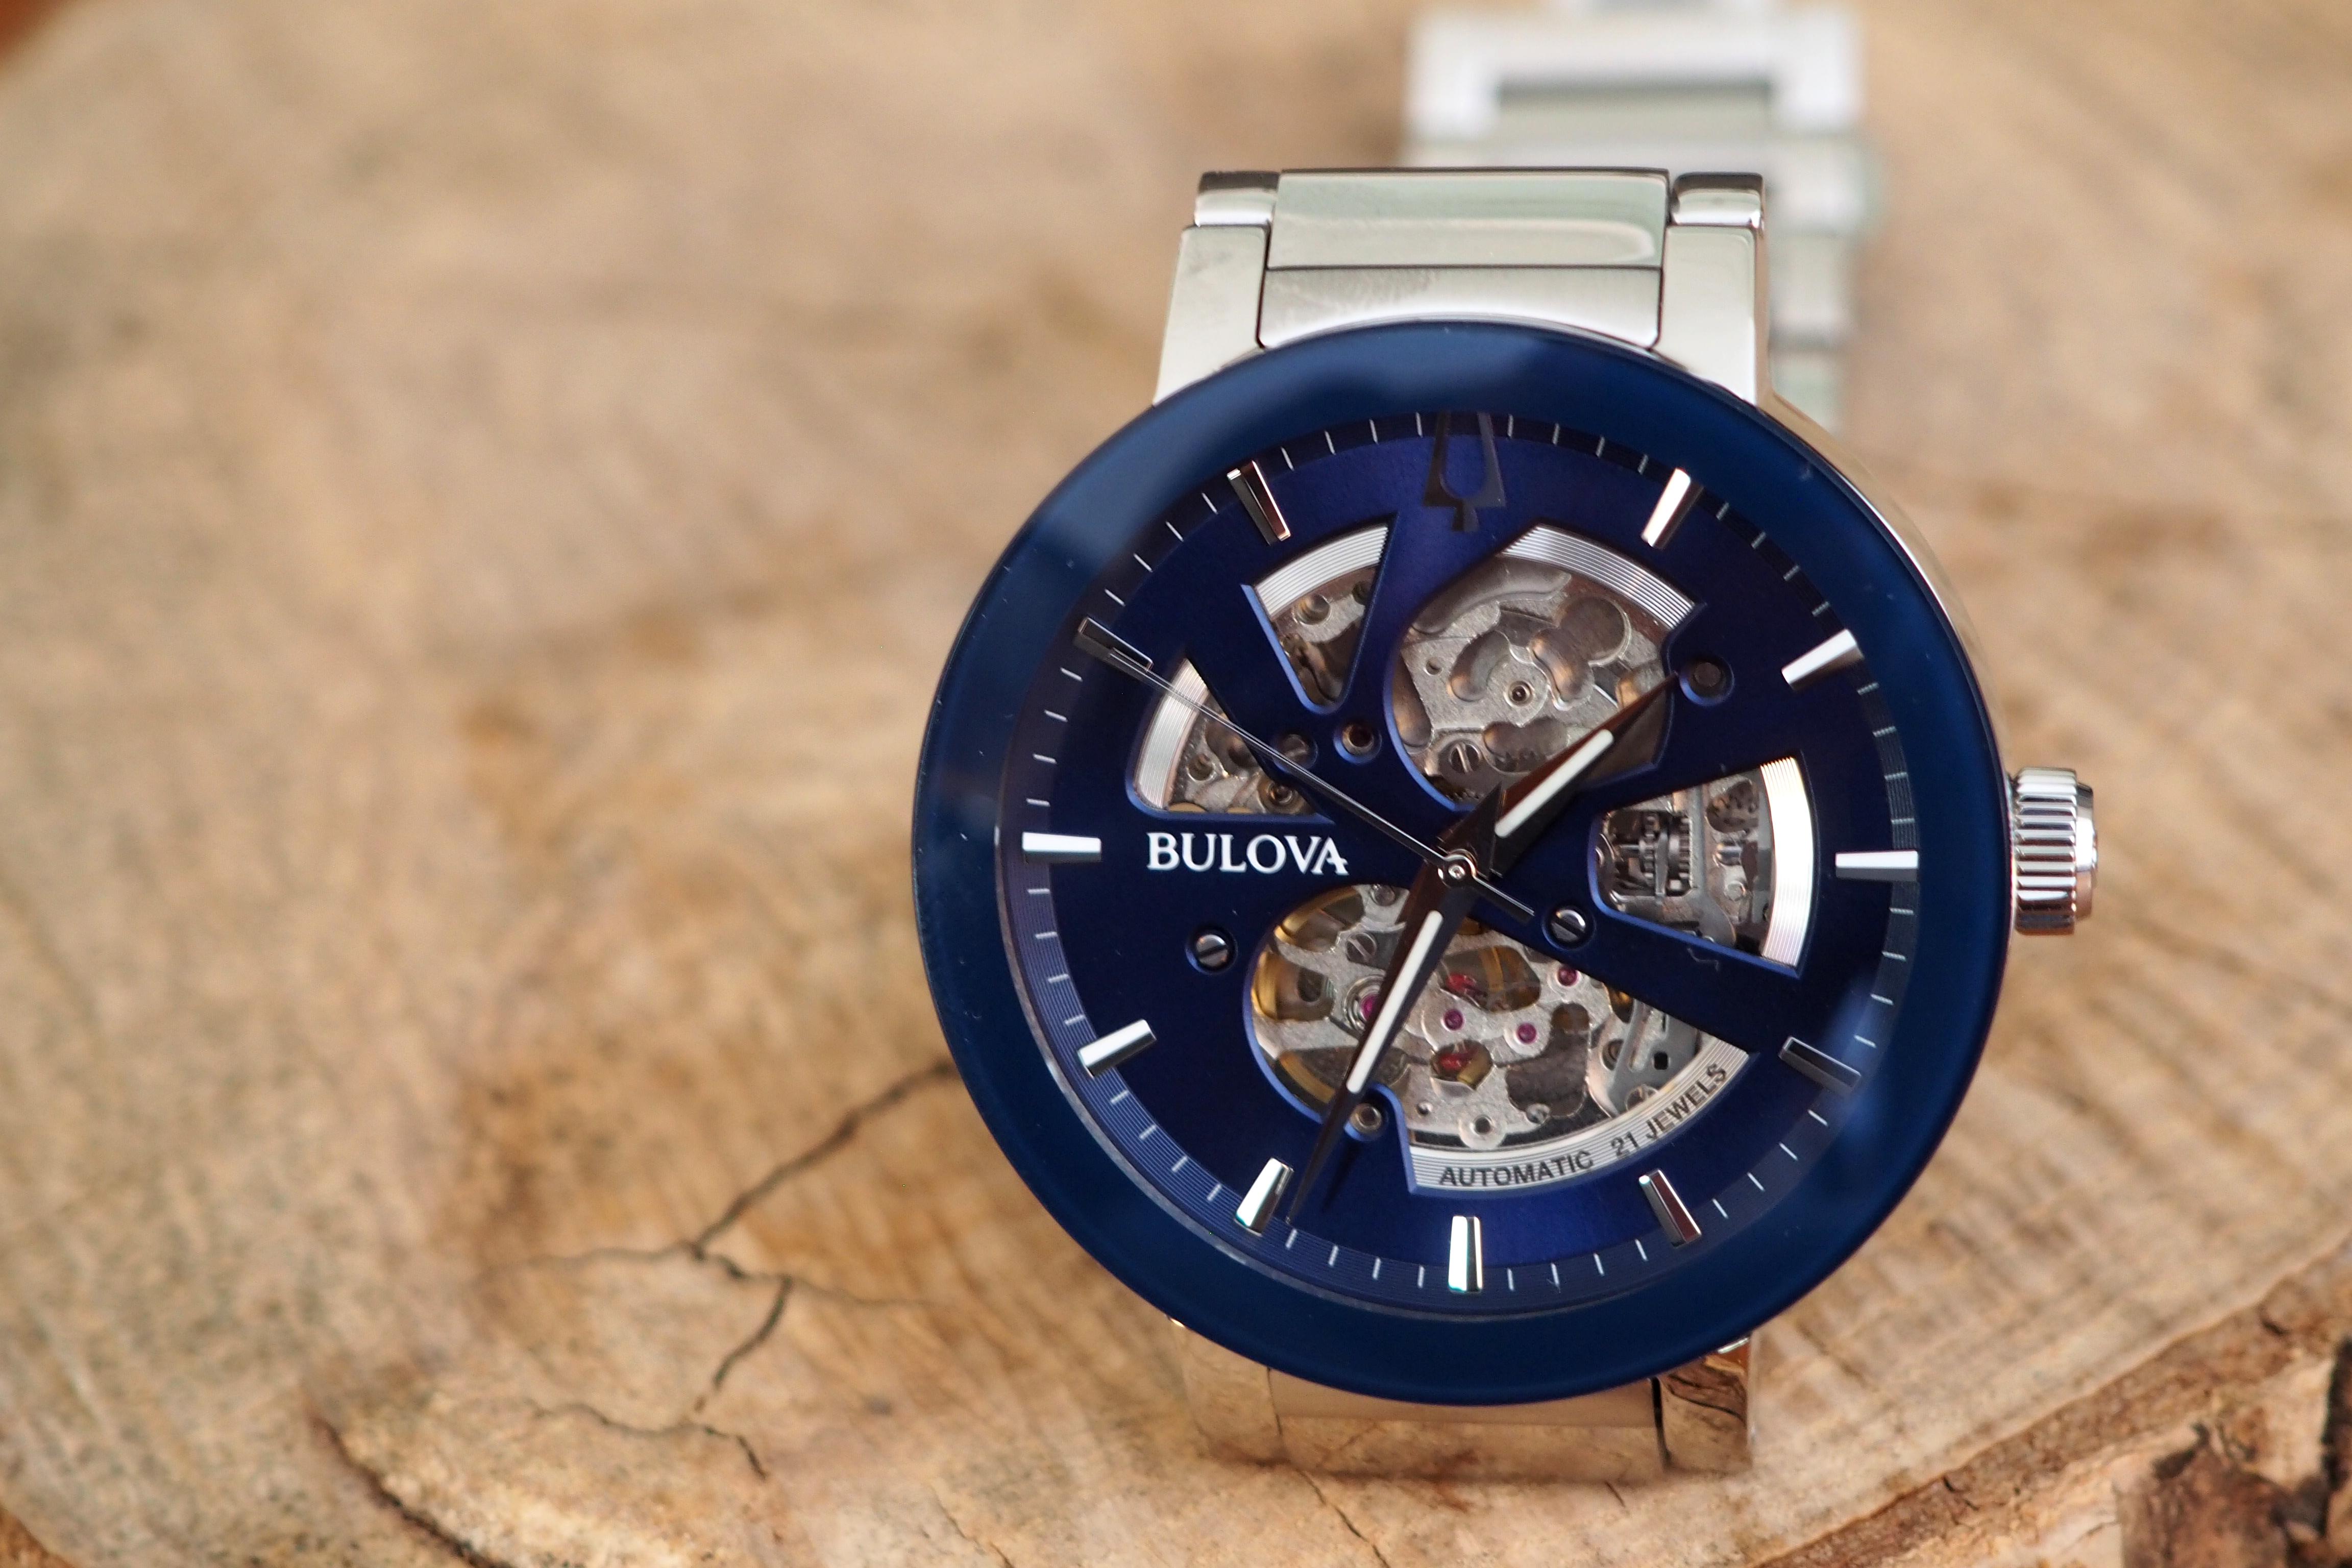 Bulova 96A204 Automatic Watch Review